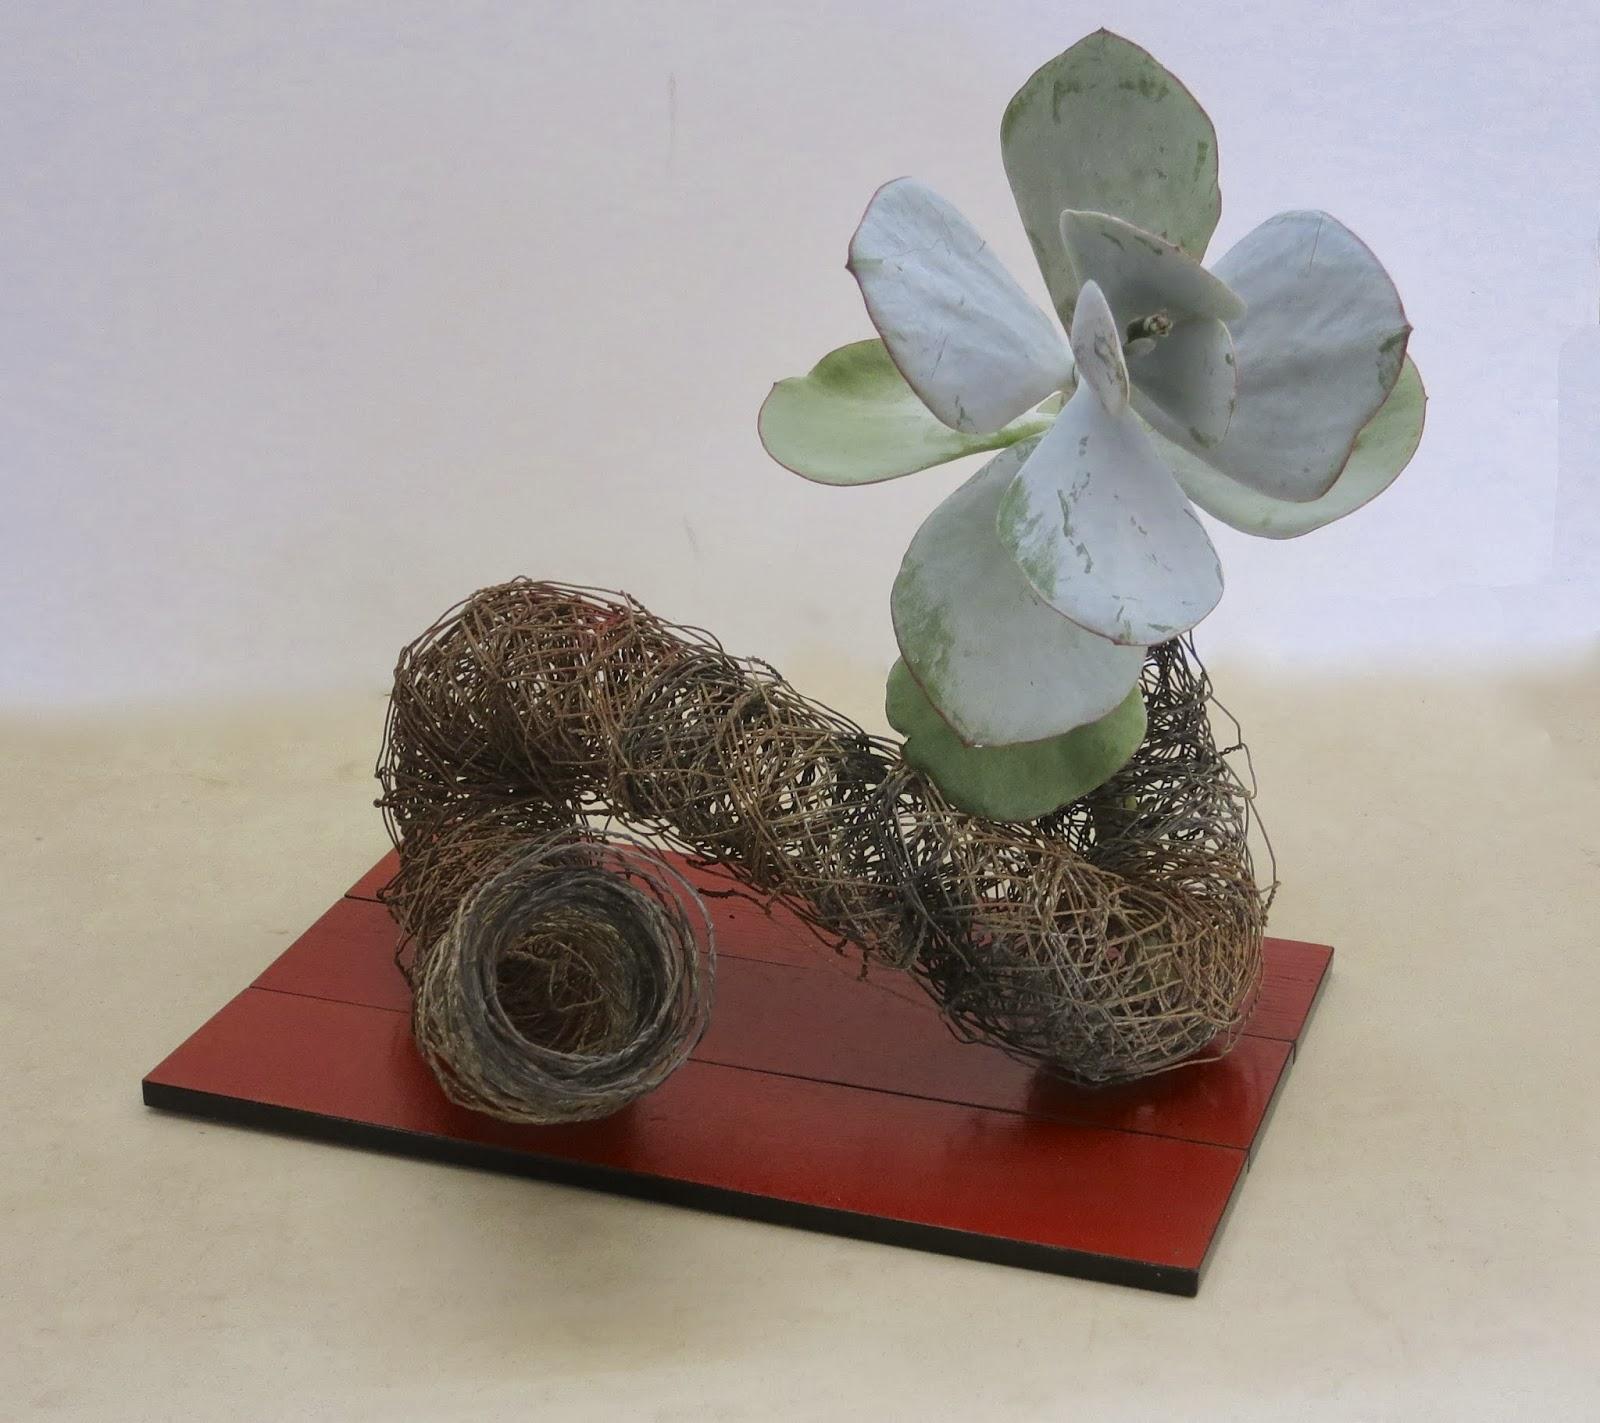 Flower Arrangement Using Driftwood: ROADSIDE IKEBANA: DRIFTWOOD AND DRYING LEAVES